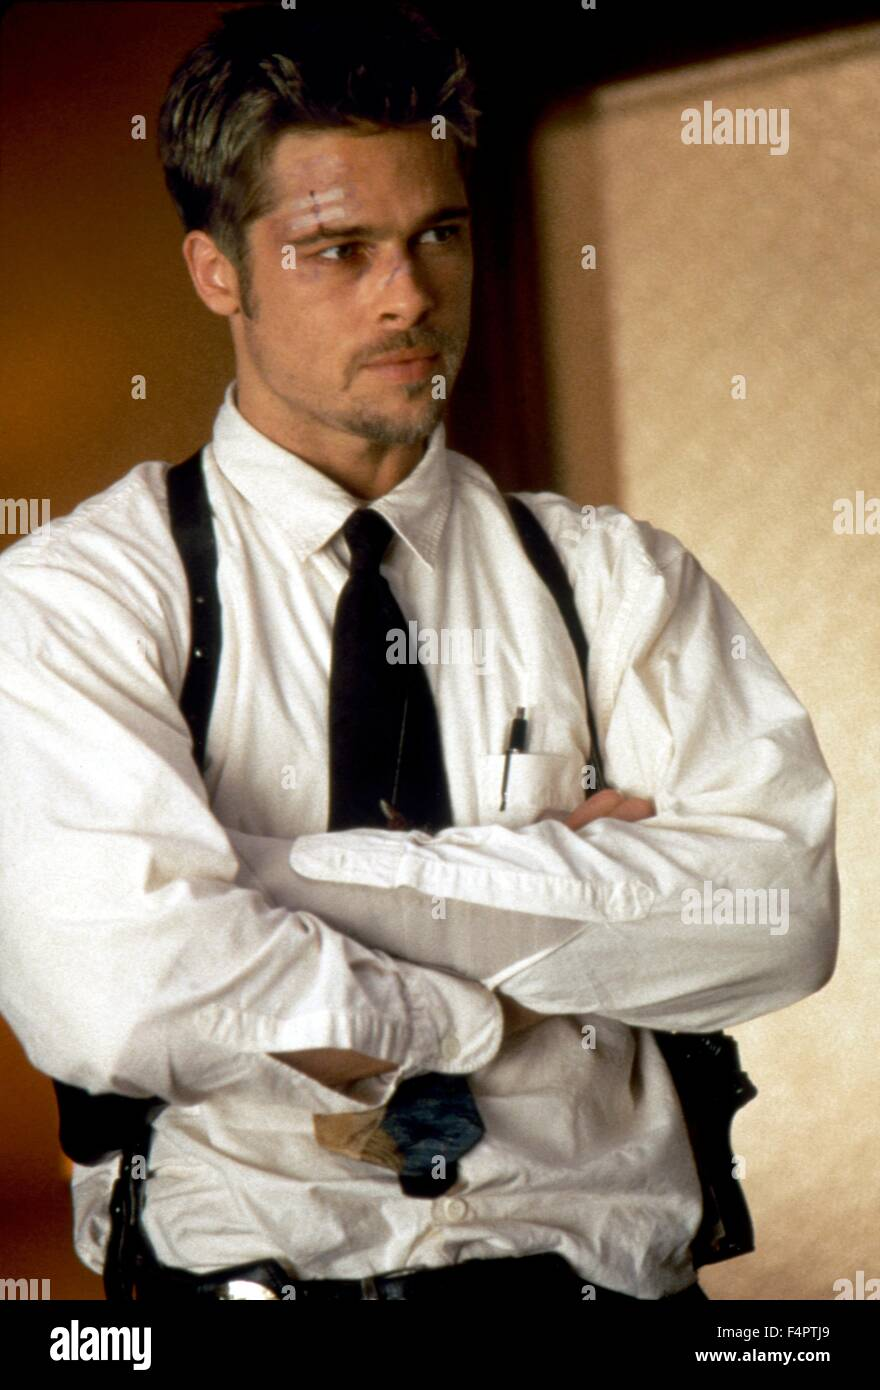 Brad Pitt / Seven / 1995 directed by David Fincher [New Line cinema] - Stock Image